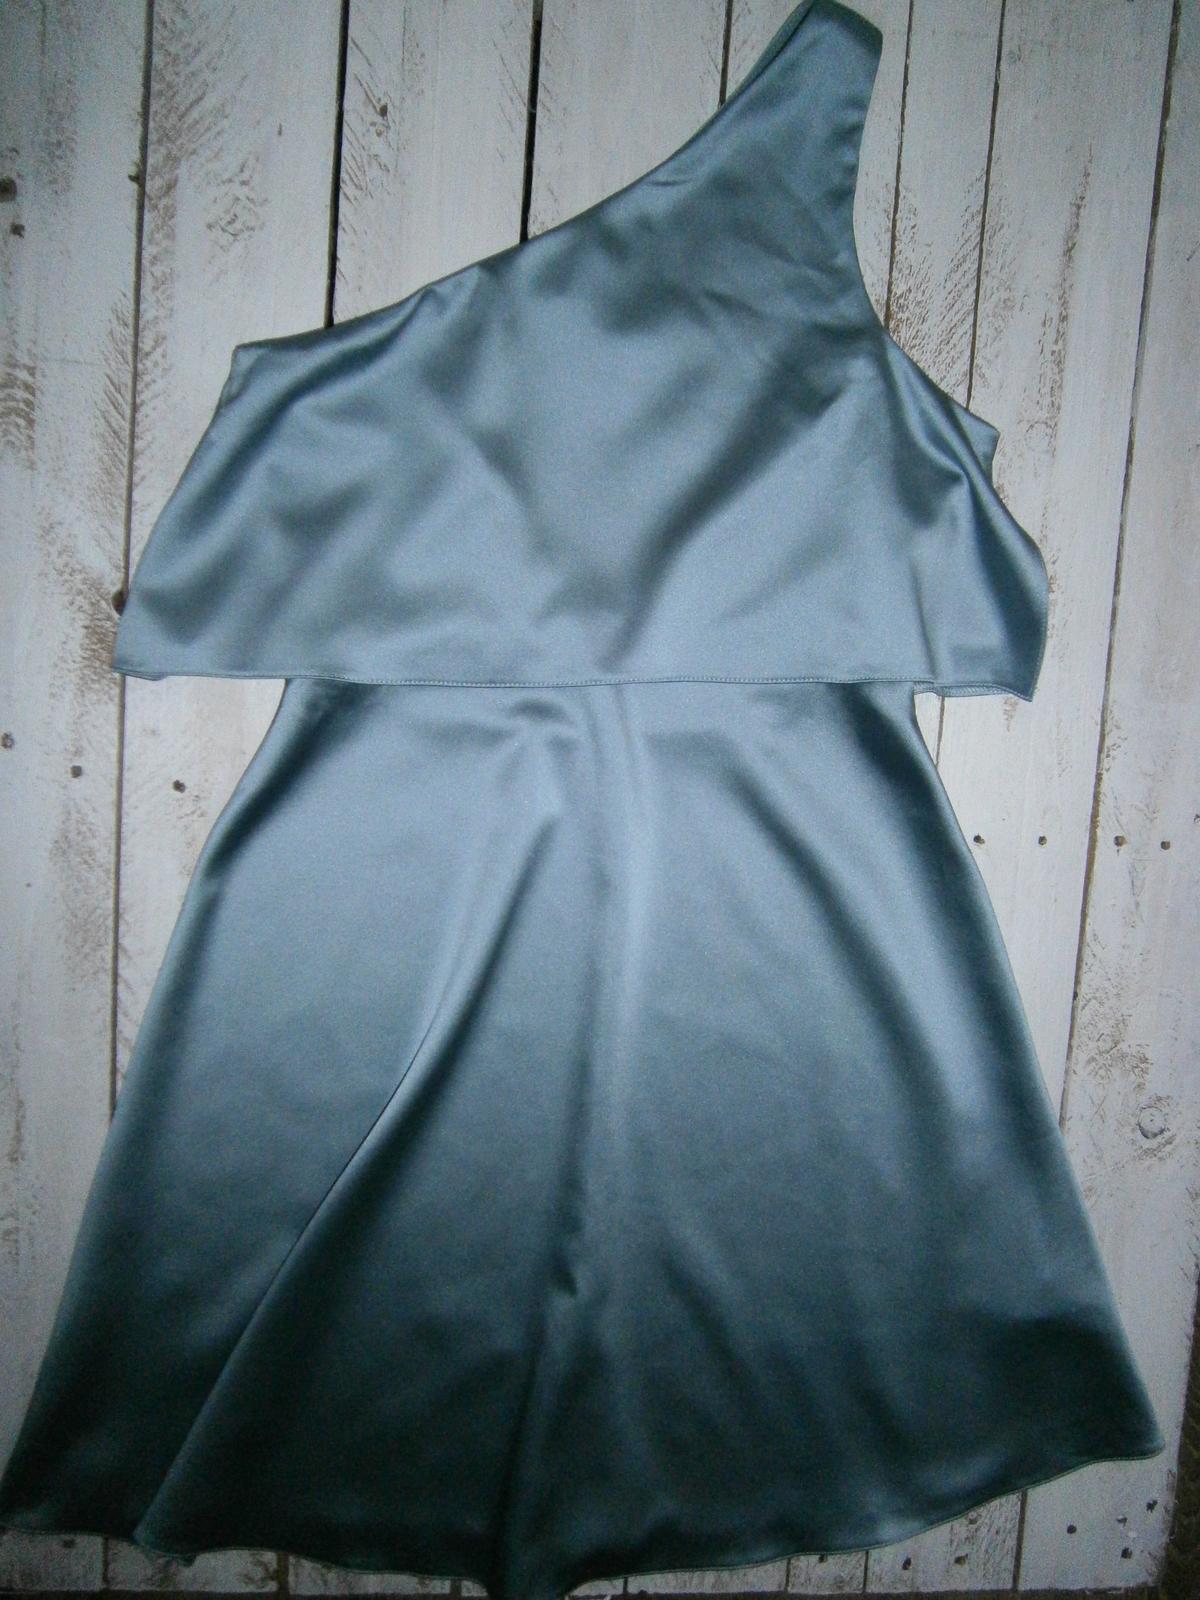 Pastelovo modré saténové šaty River Island, XS/S - Obrázok č. 1